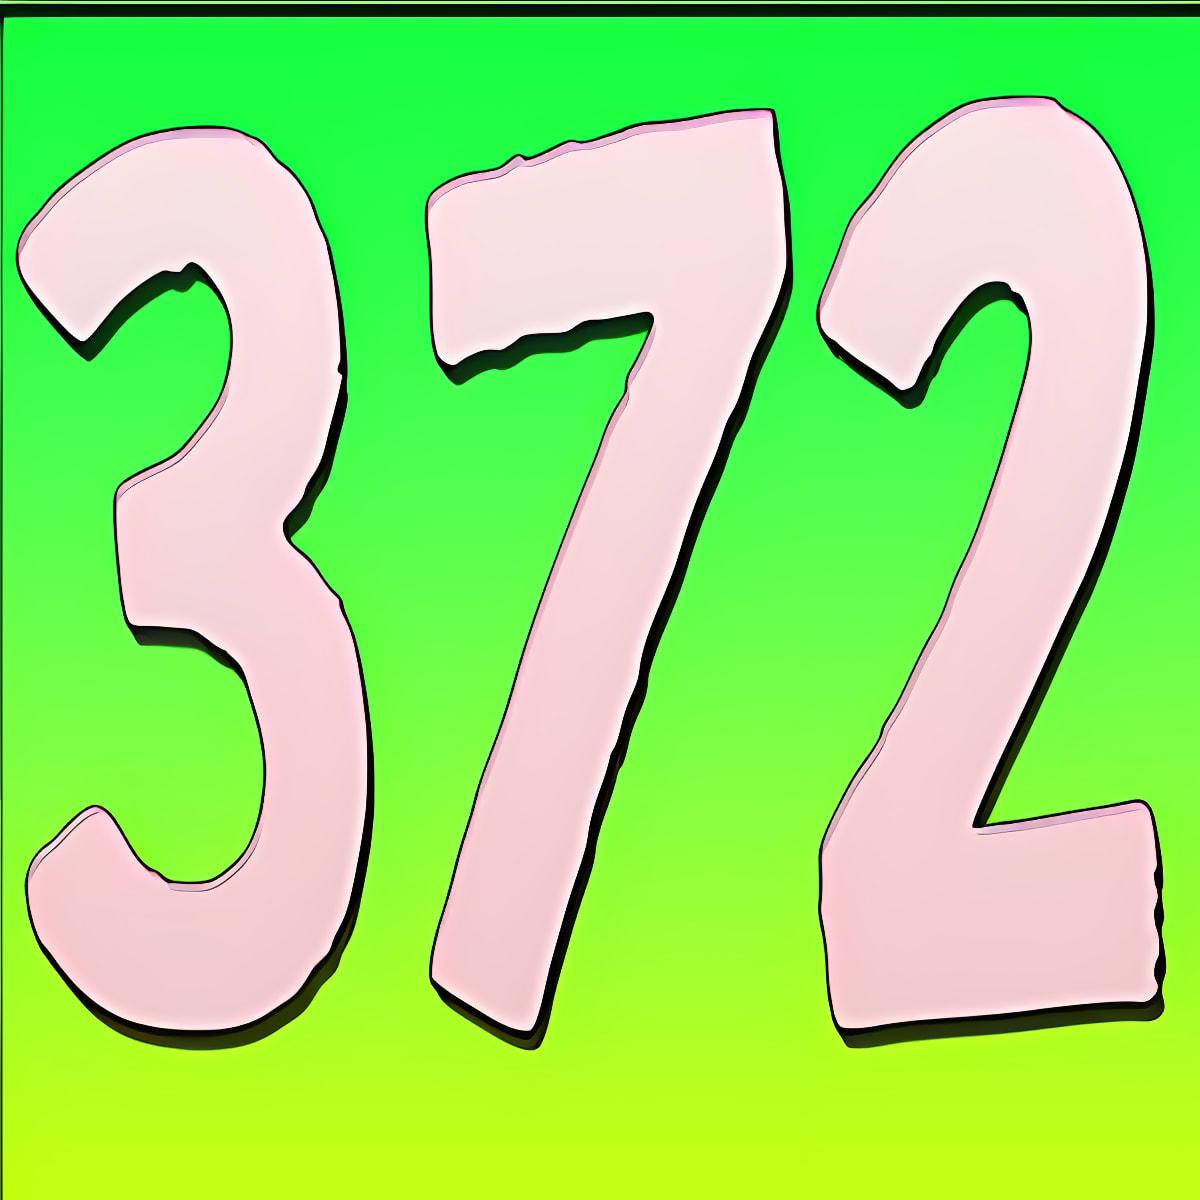 Desafío de matemáticas 1